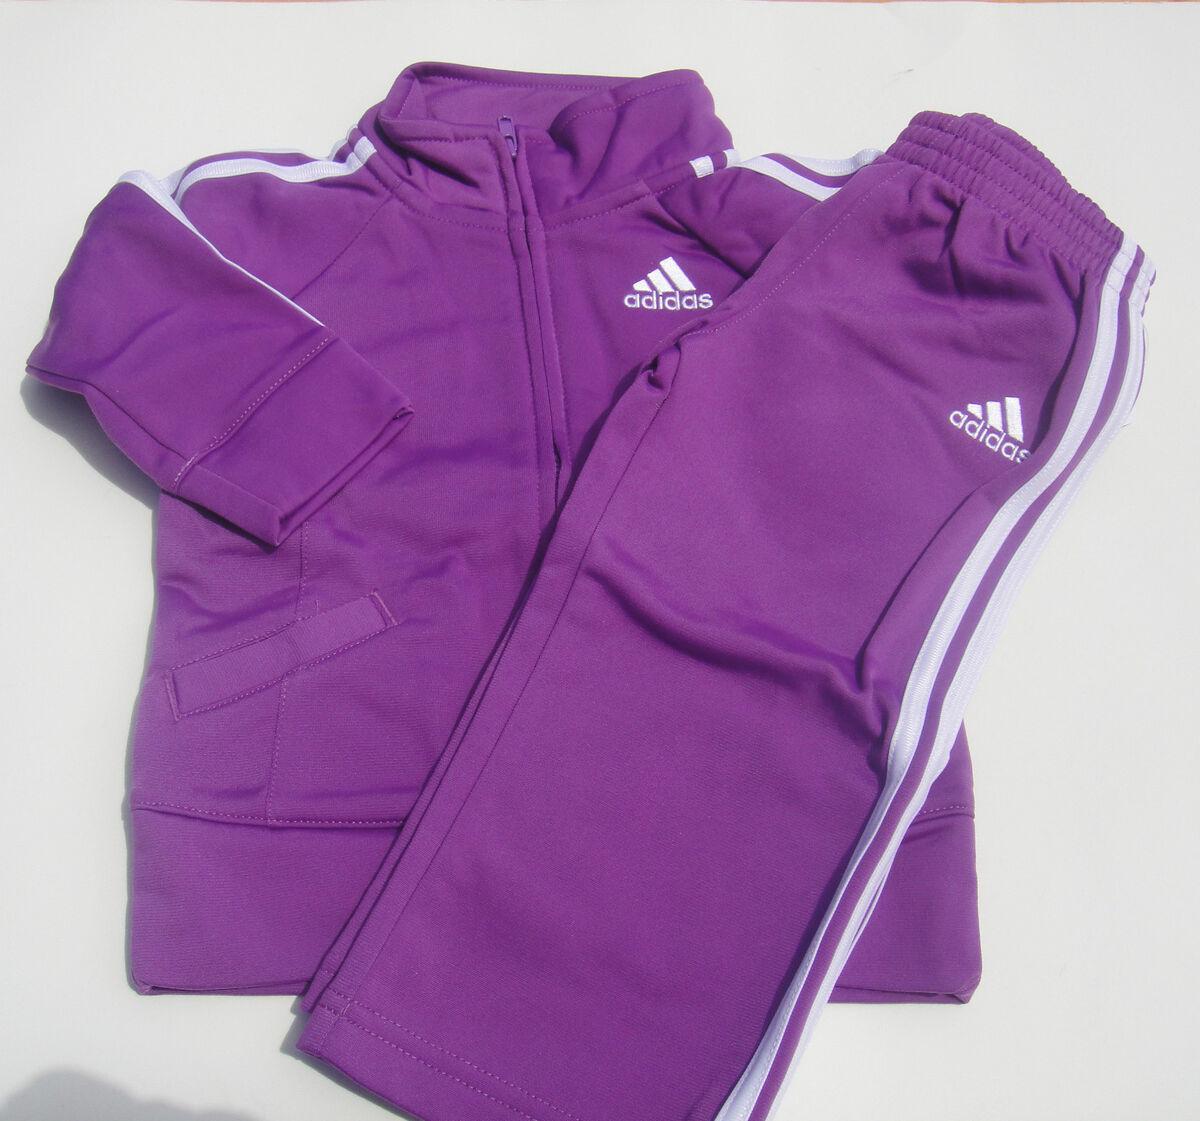 Adidas Girls Track Suit 19207 Track Jacket Top Pantalones 18 Dark Purple 501 Warm Up 12 18 3183139 - immunitetfolie.website